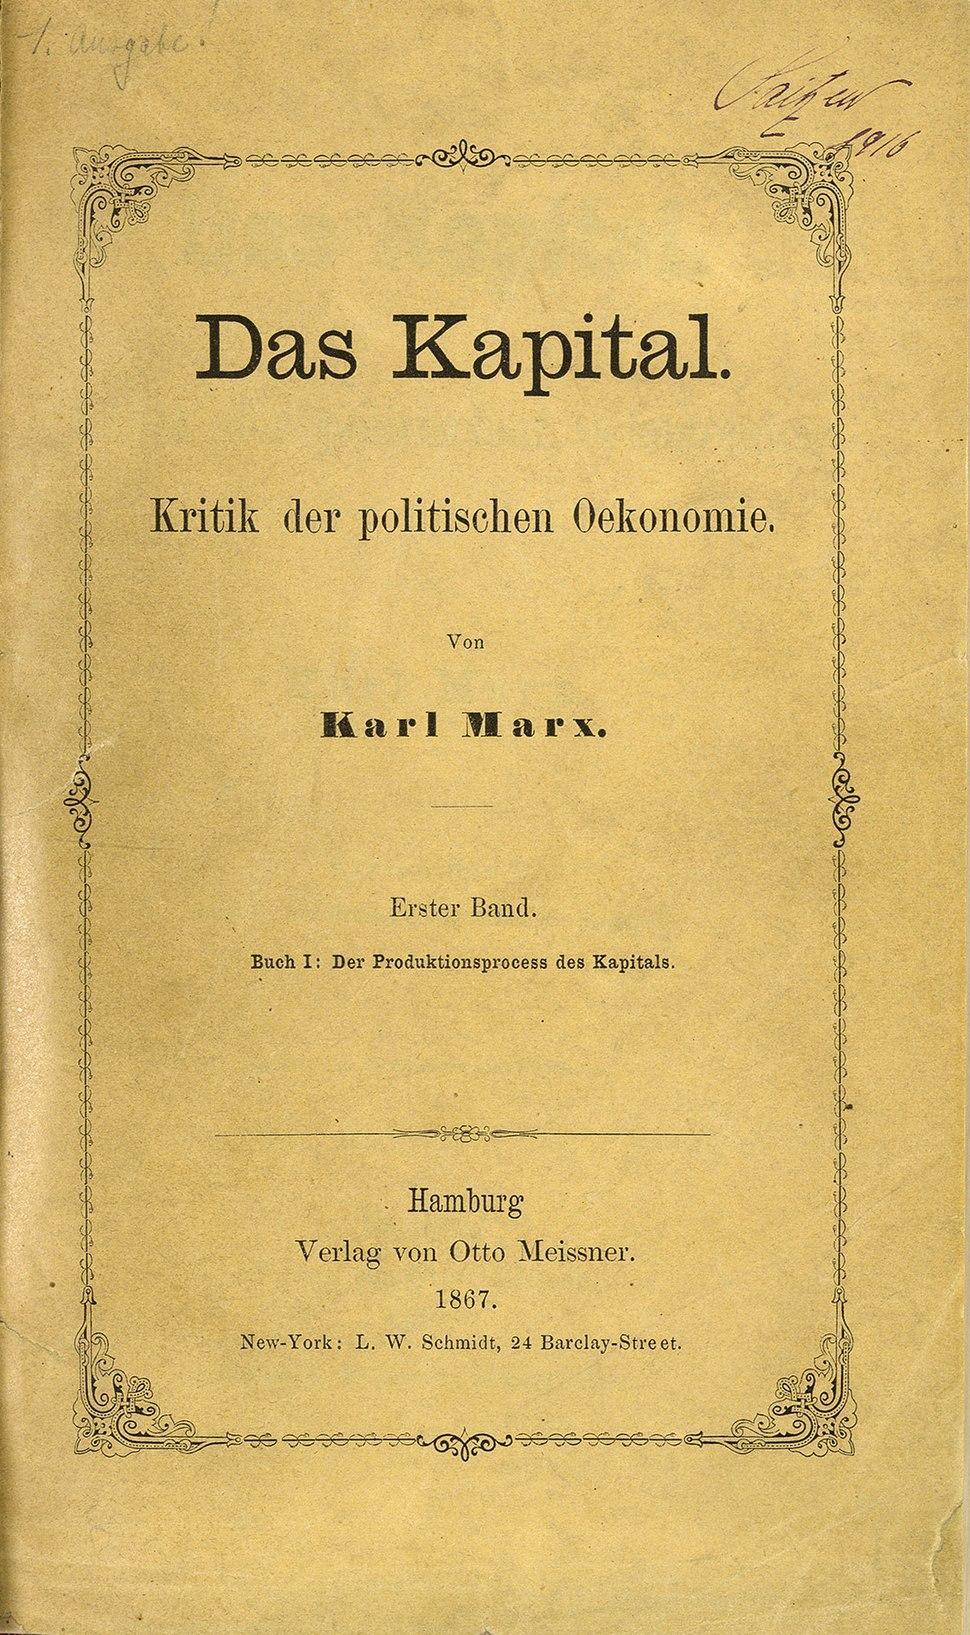 Zentralbibliothek Zürich Das Kapital Marx 1867